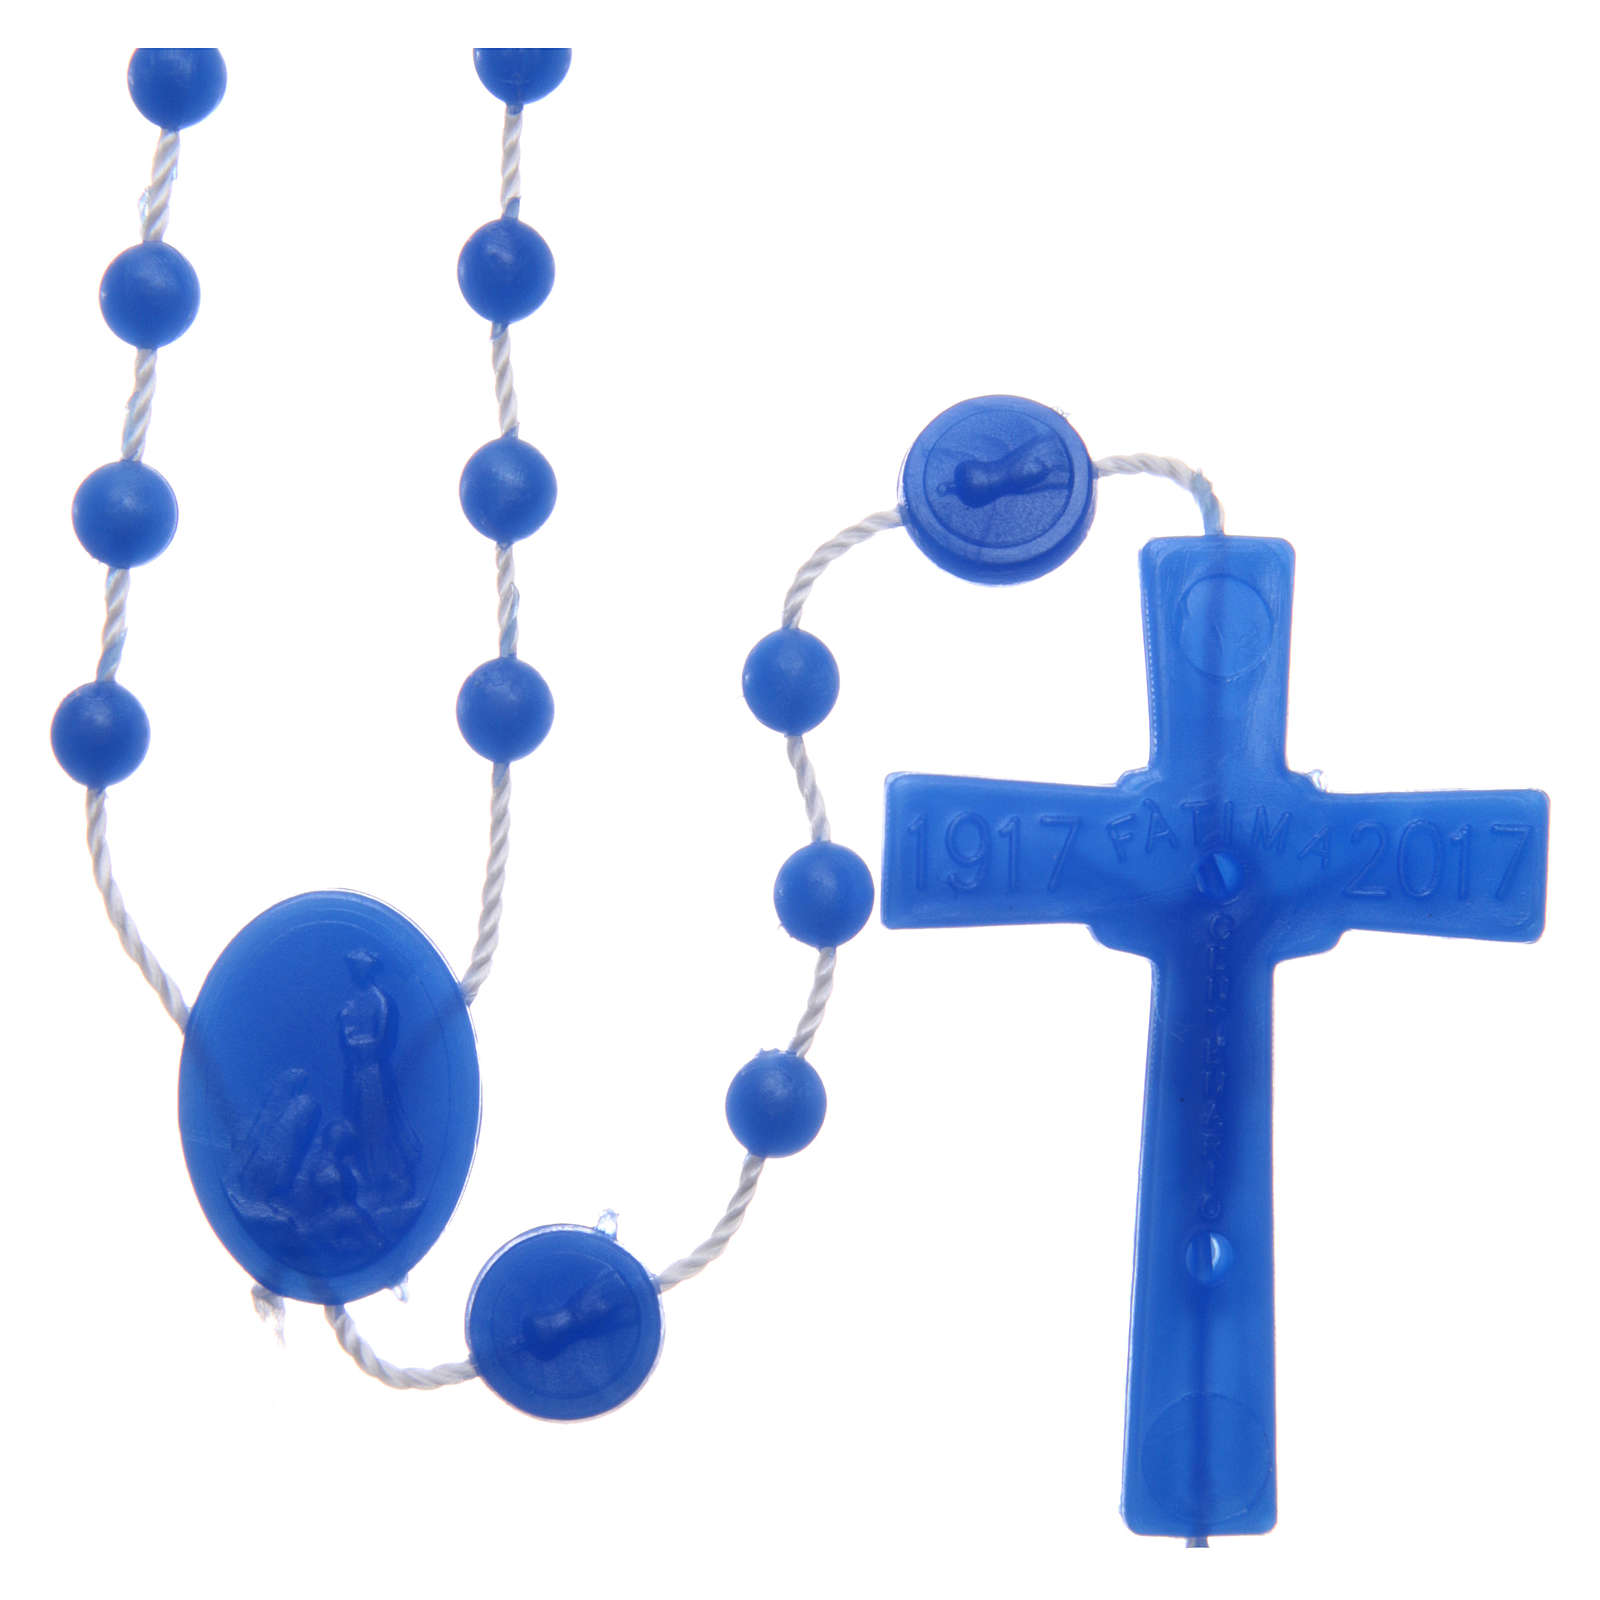 Chapelet nylon bleu Fatima 6 mm 4